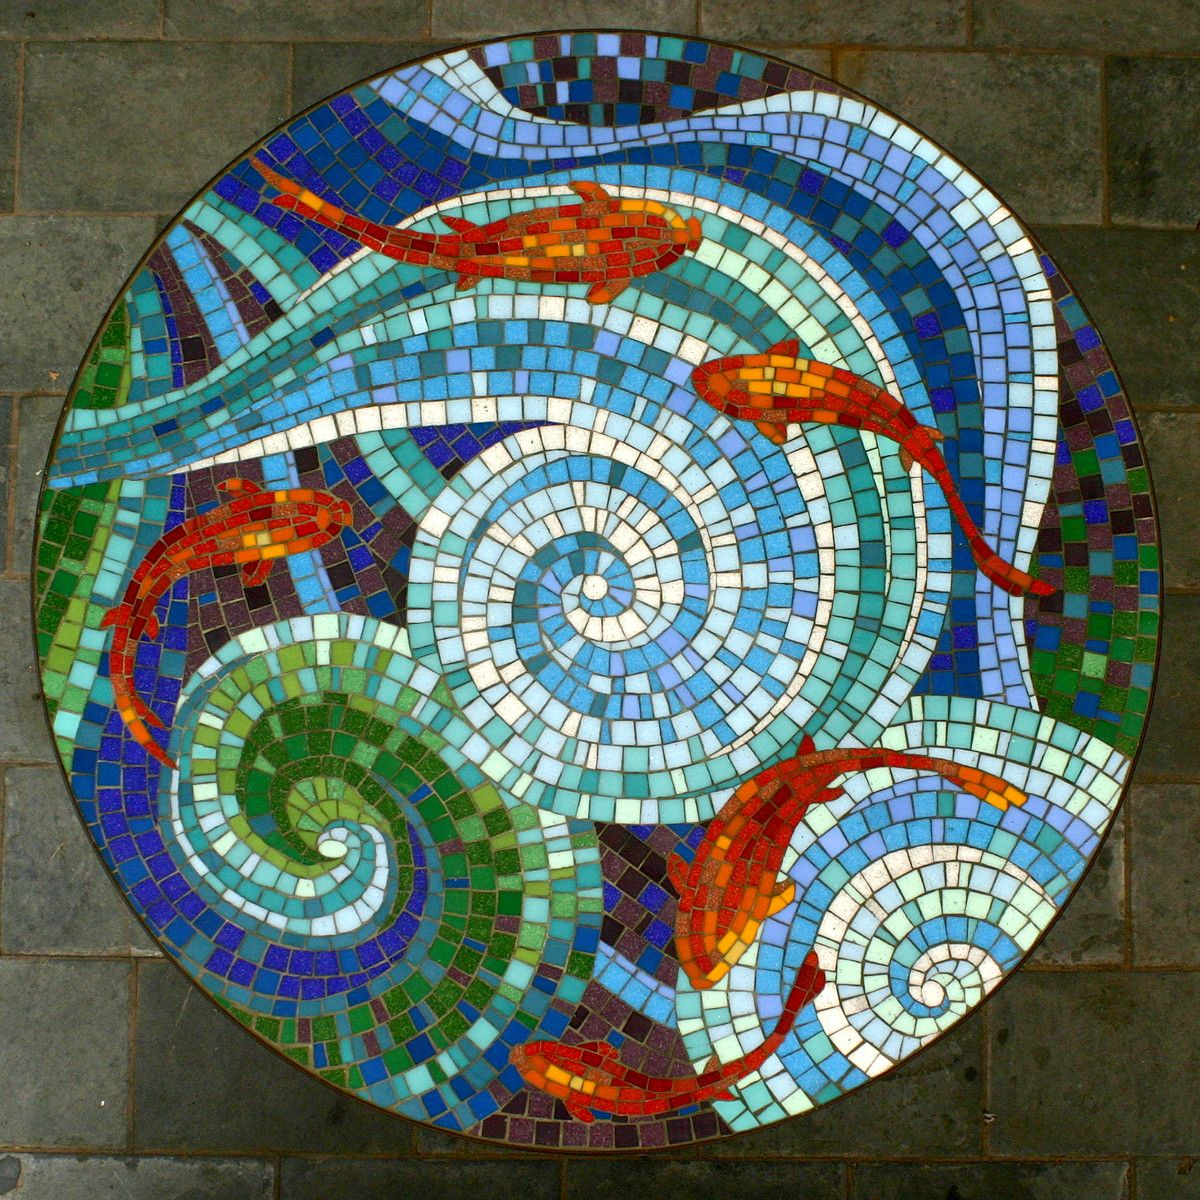 Table Mosaic Patterns: Cintia Cimbaluk …